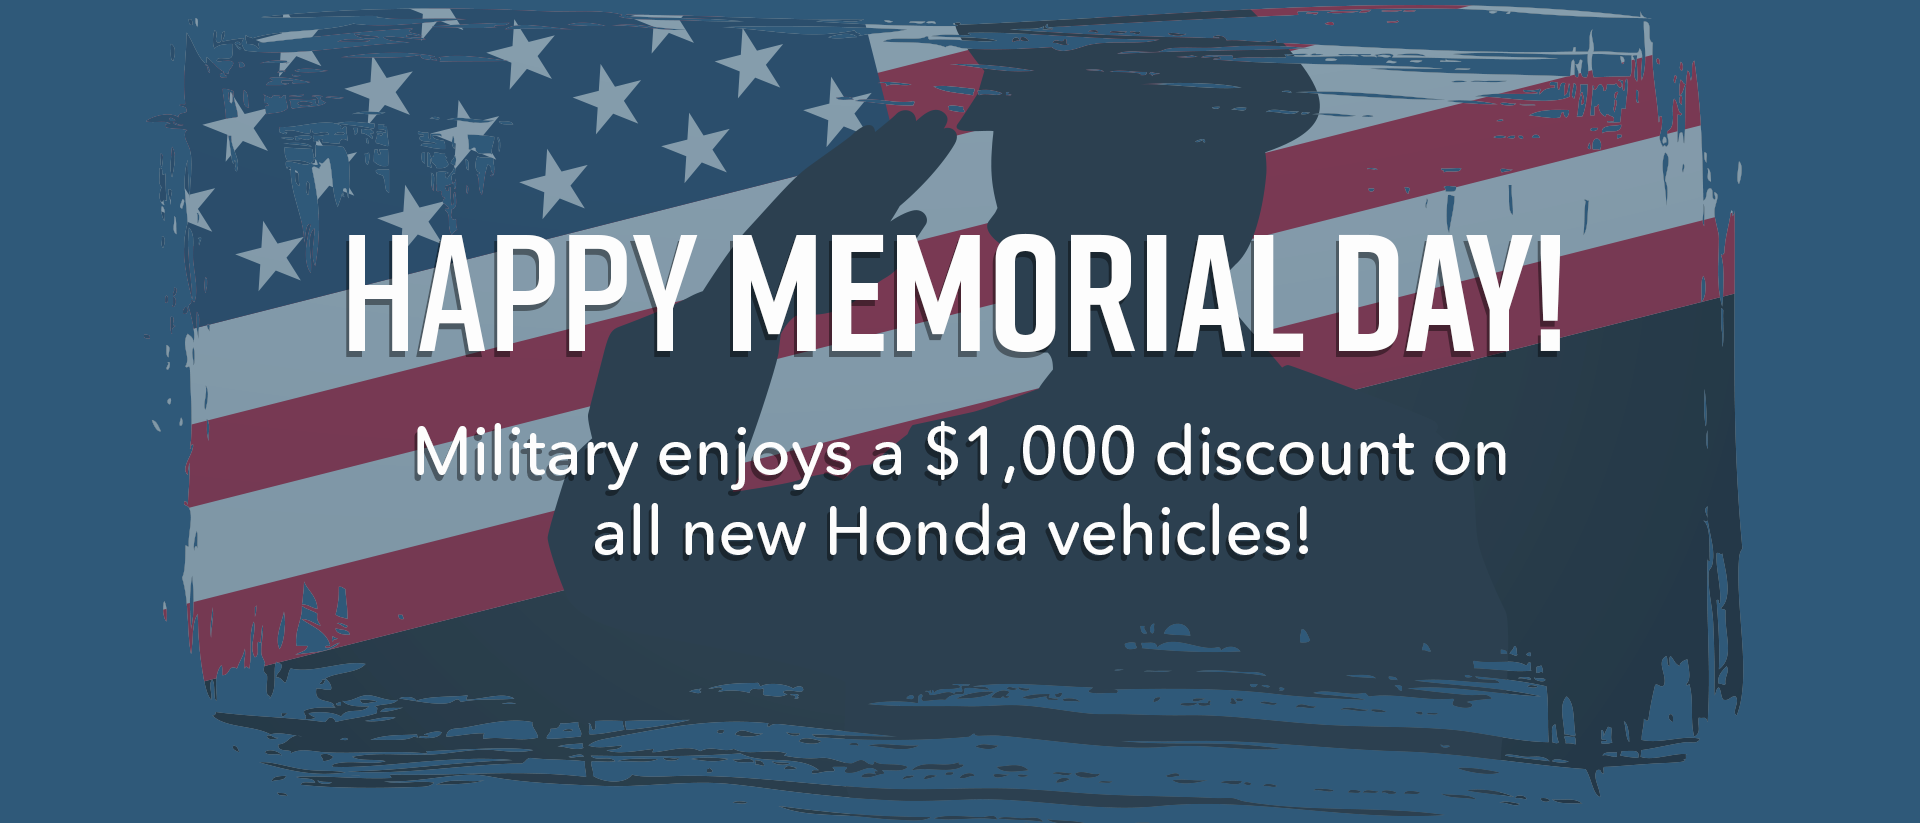 Military enjoys $1000 discount on all new Honda vehicles!